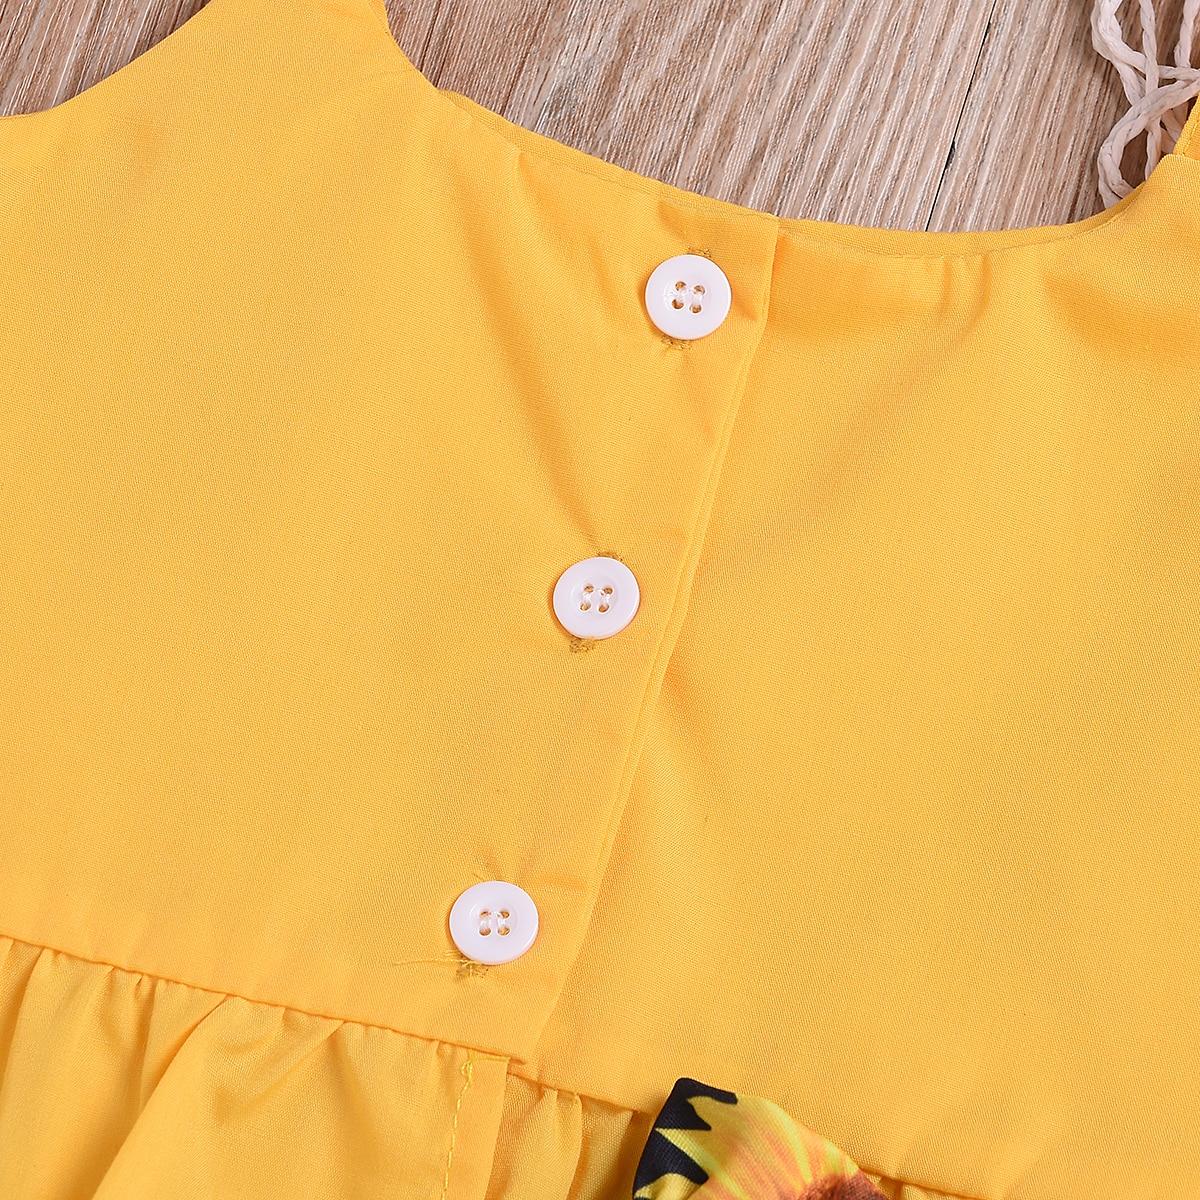 523ef1d4ee3b1 Toddler Baby Kid Girl Holiday Clothes Sets Yellow Sleeveless Tops T-shirt  Tank Floral Shorts Pants ...